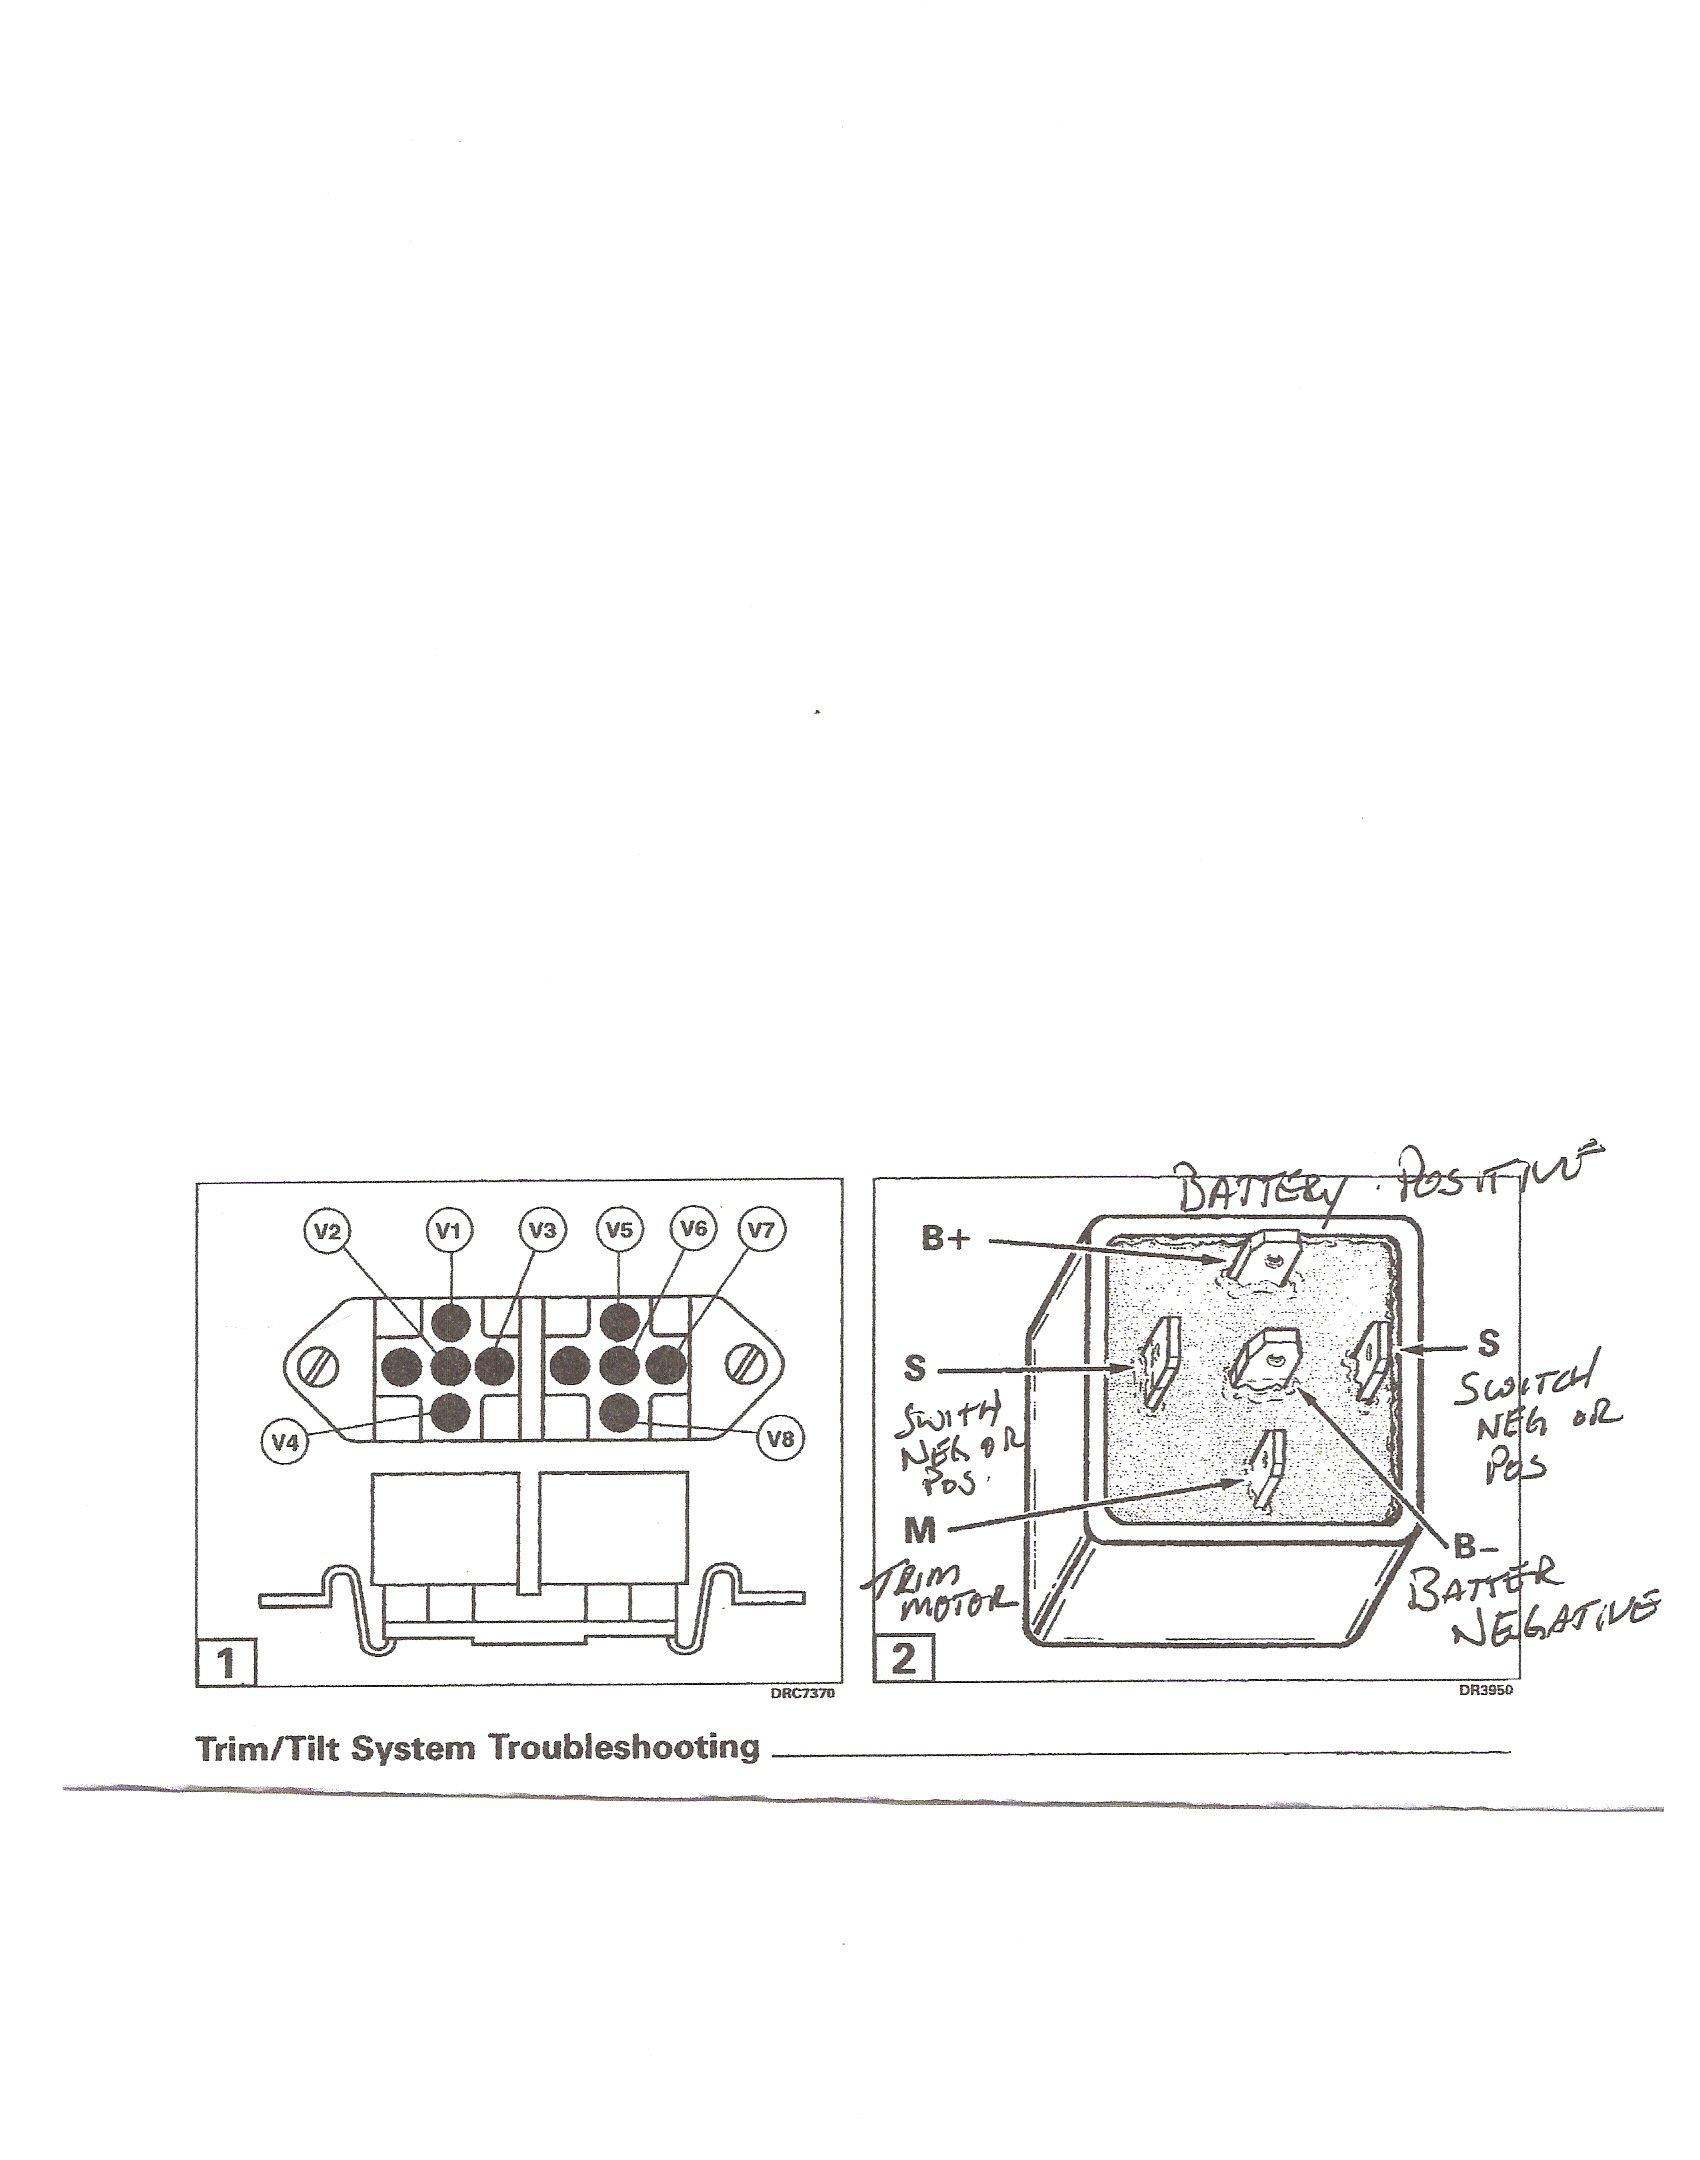 1985 Bayliner Capri Wiring Diagram on